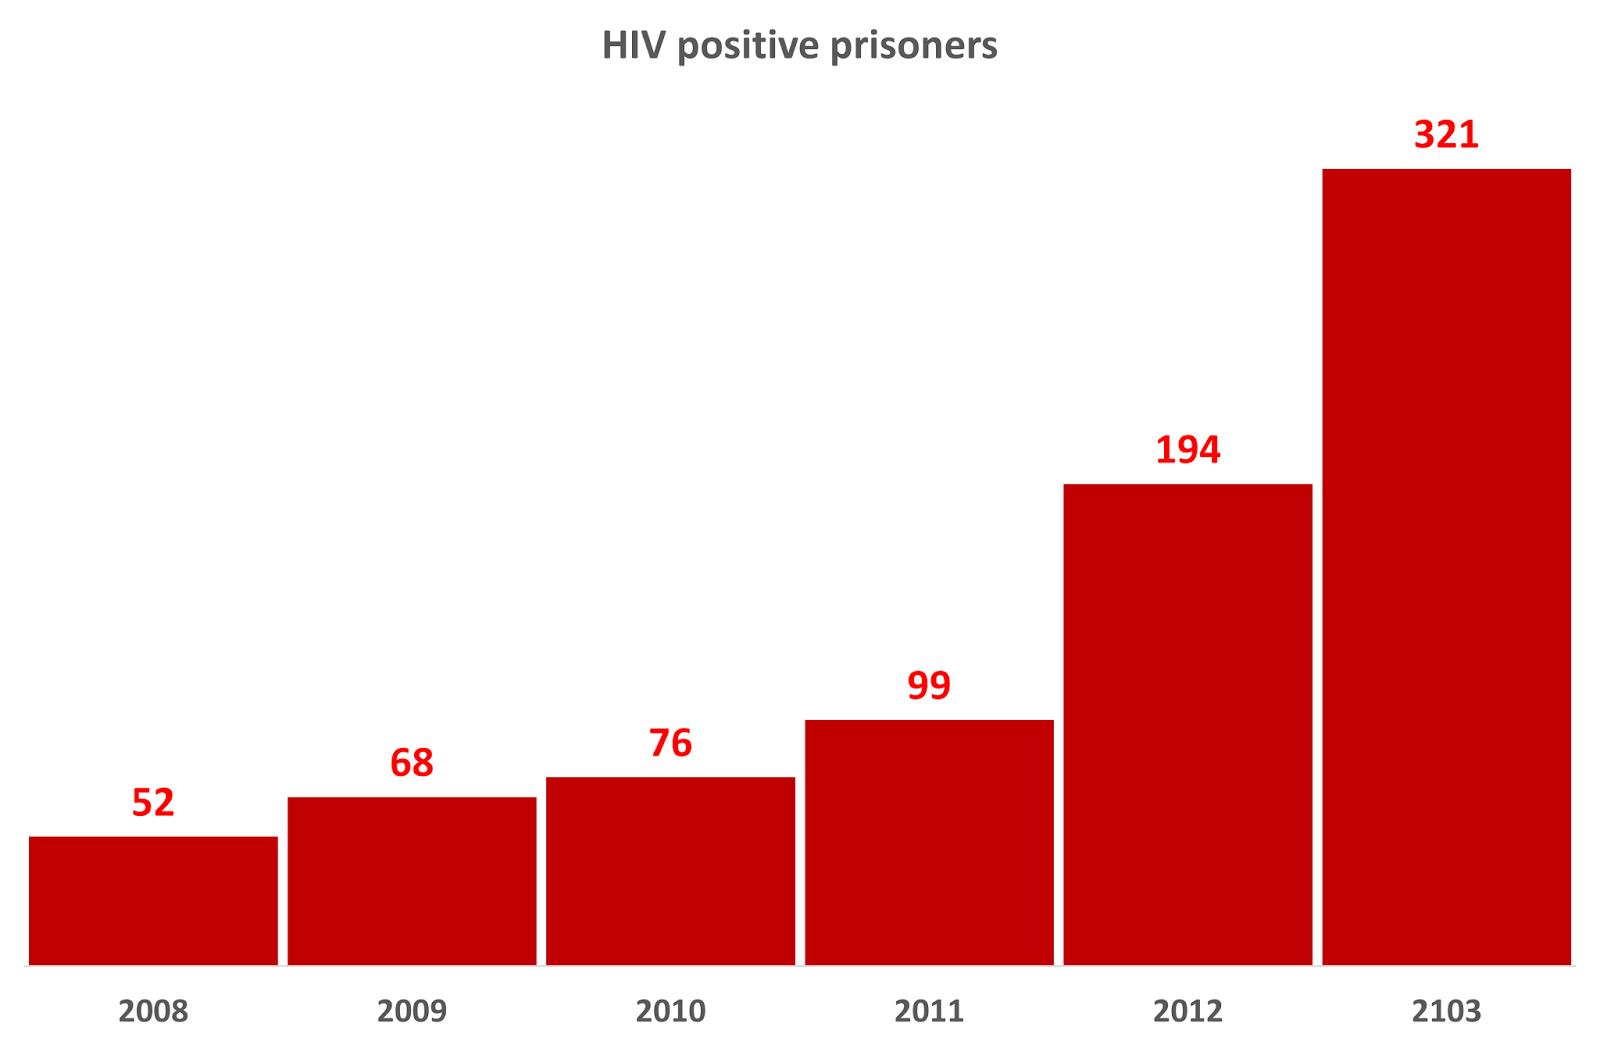 Hiv In Opkomst In Roemeense Gevangenissen Civil Liberties Union For Europe